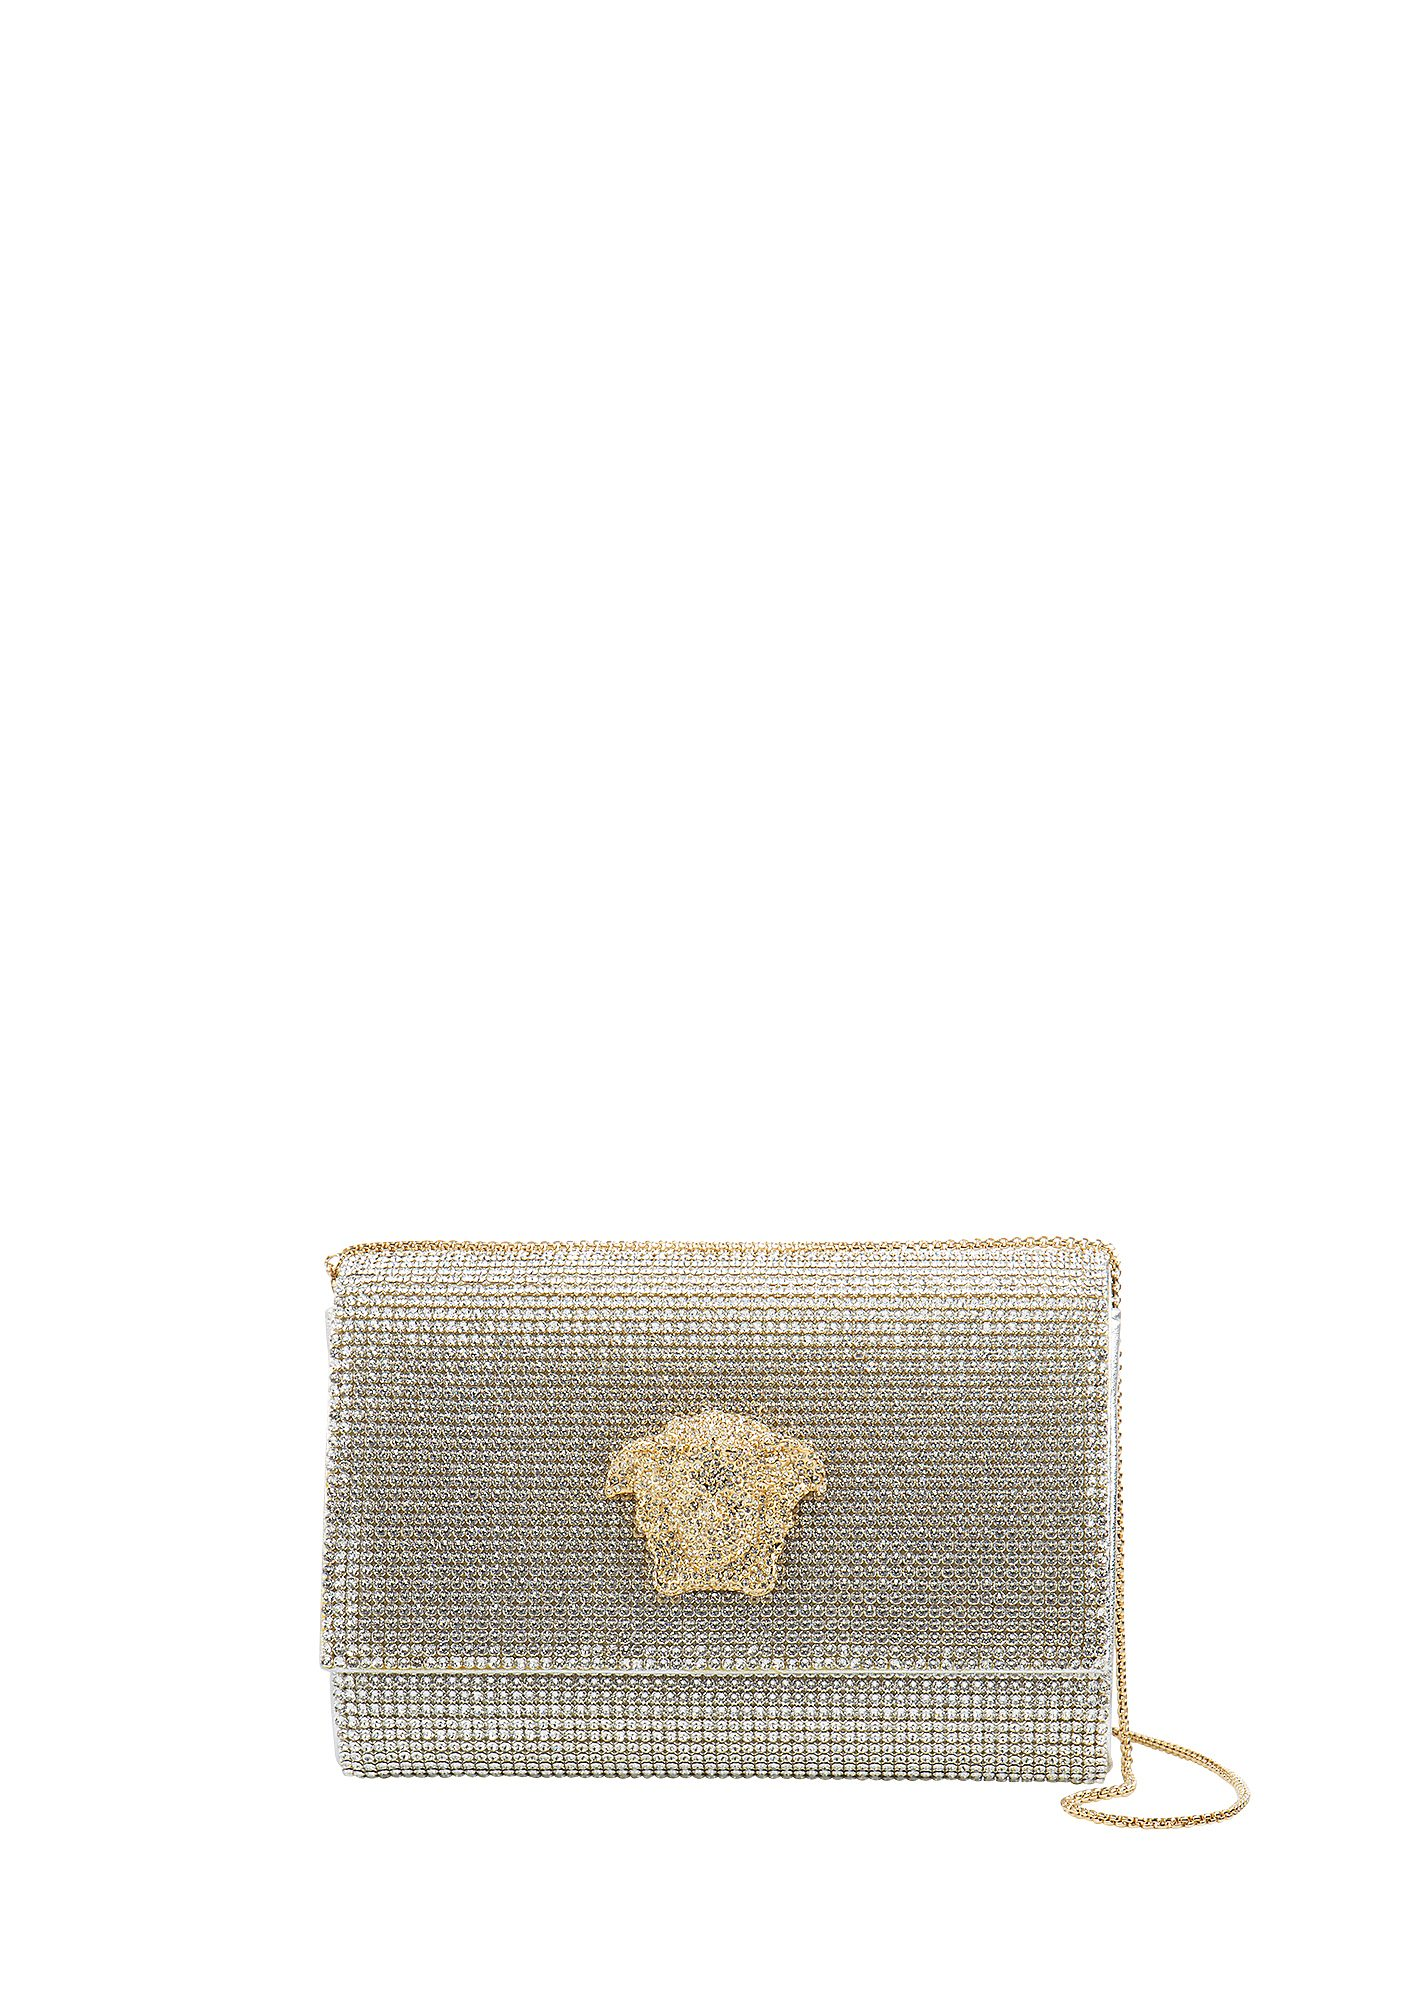 Versace Palazzo Swarovski Mesh Clutch In Crystal Mesh   ModeSens a8999b3302